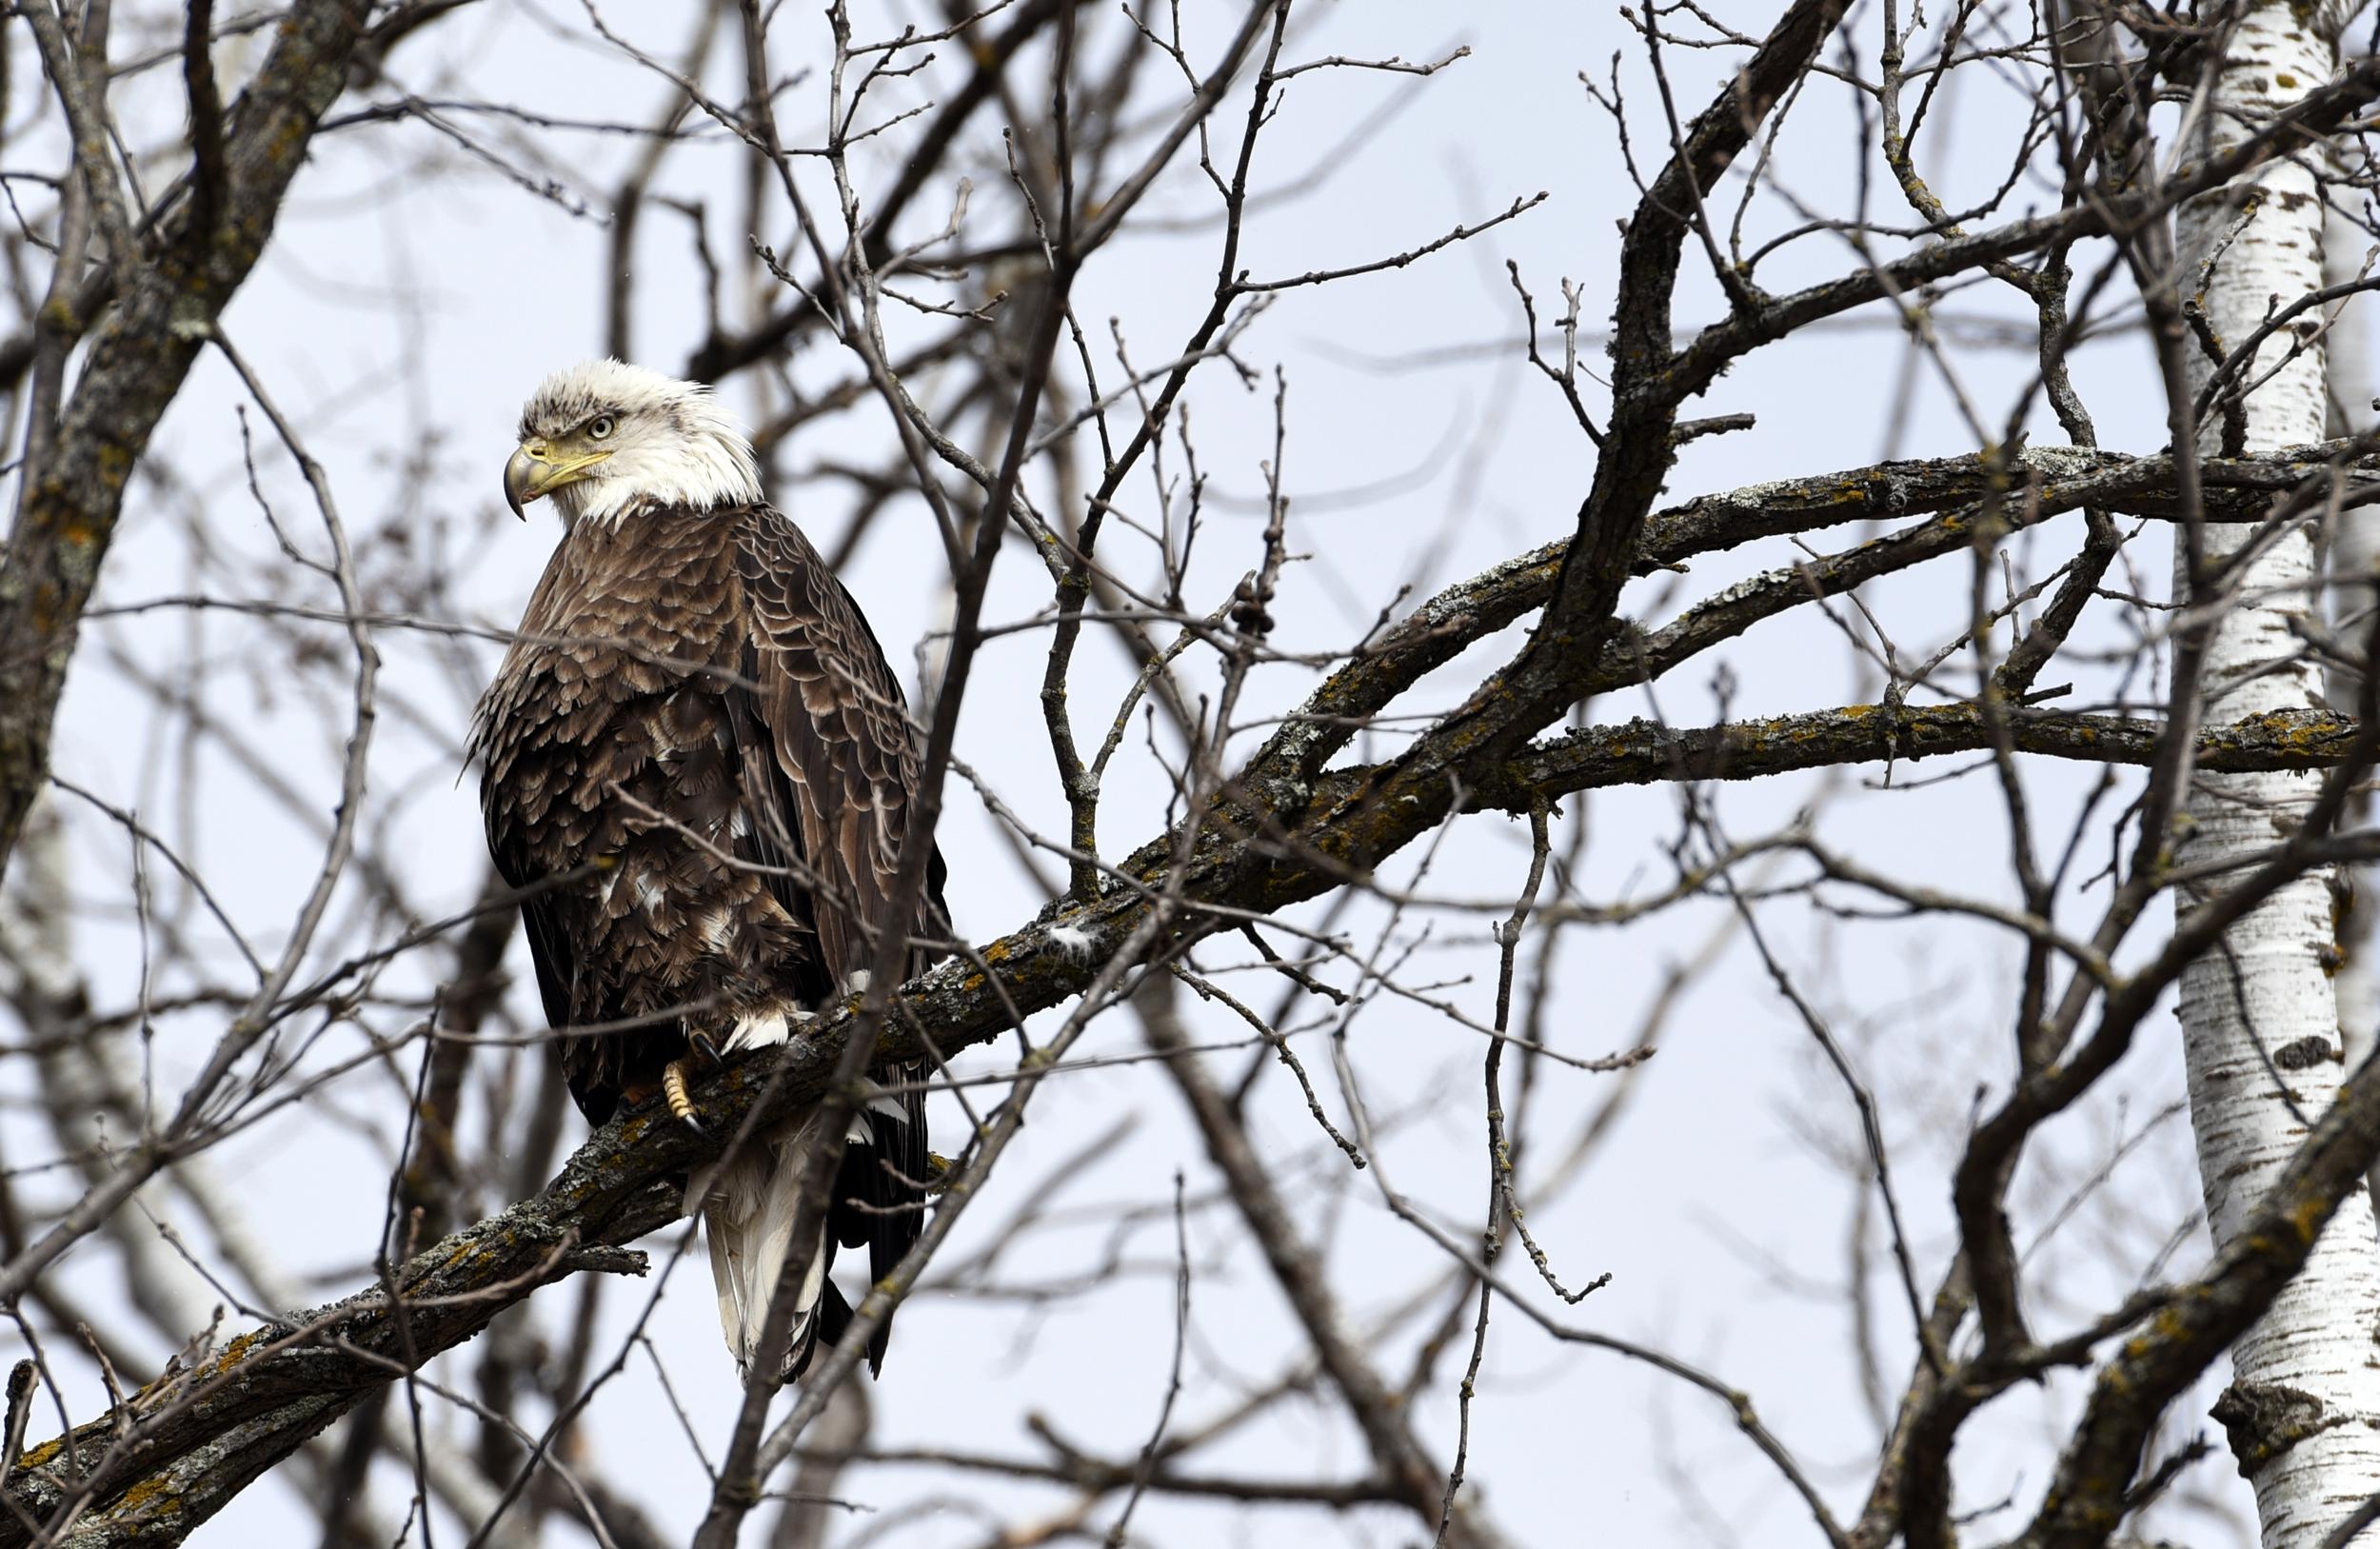 A bald eagle perches in a tree along U.S. Highway 71 in Bemidji.